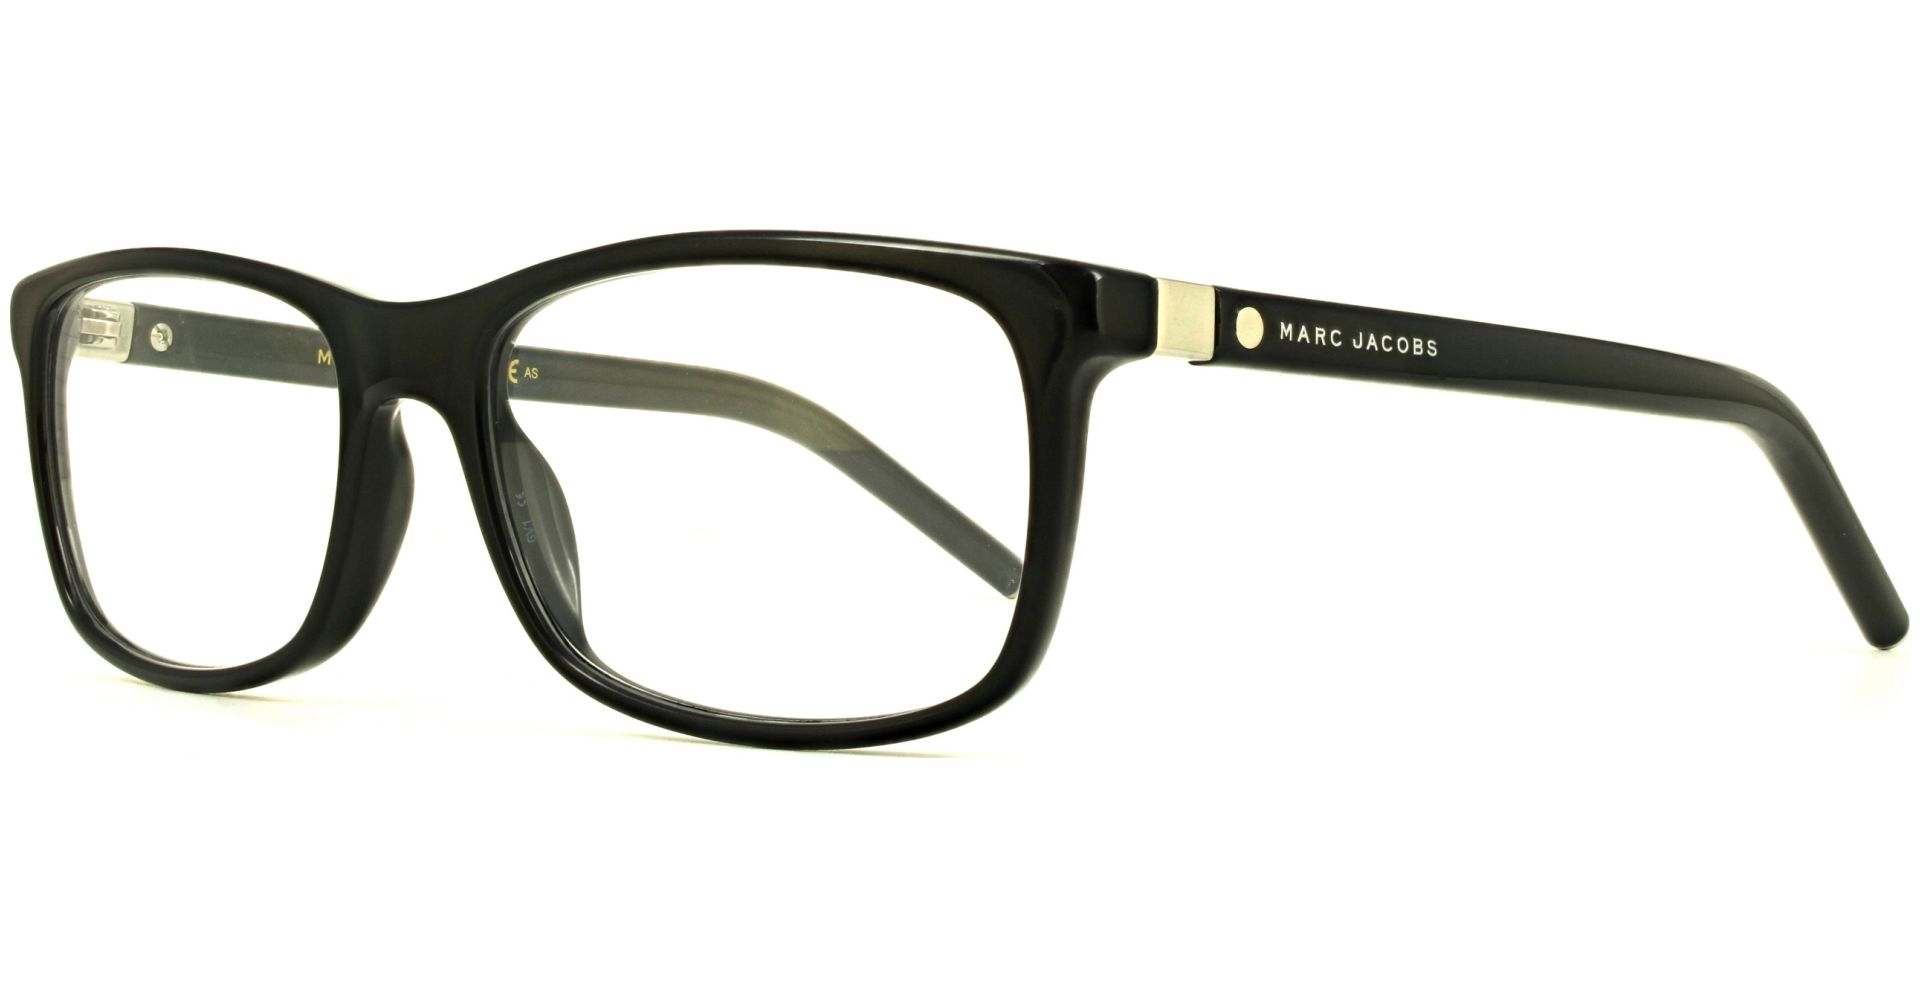 Marc Jacobs - 74 807 5417 Black - von Lensbest